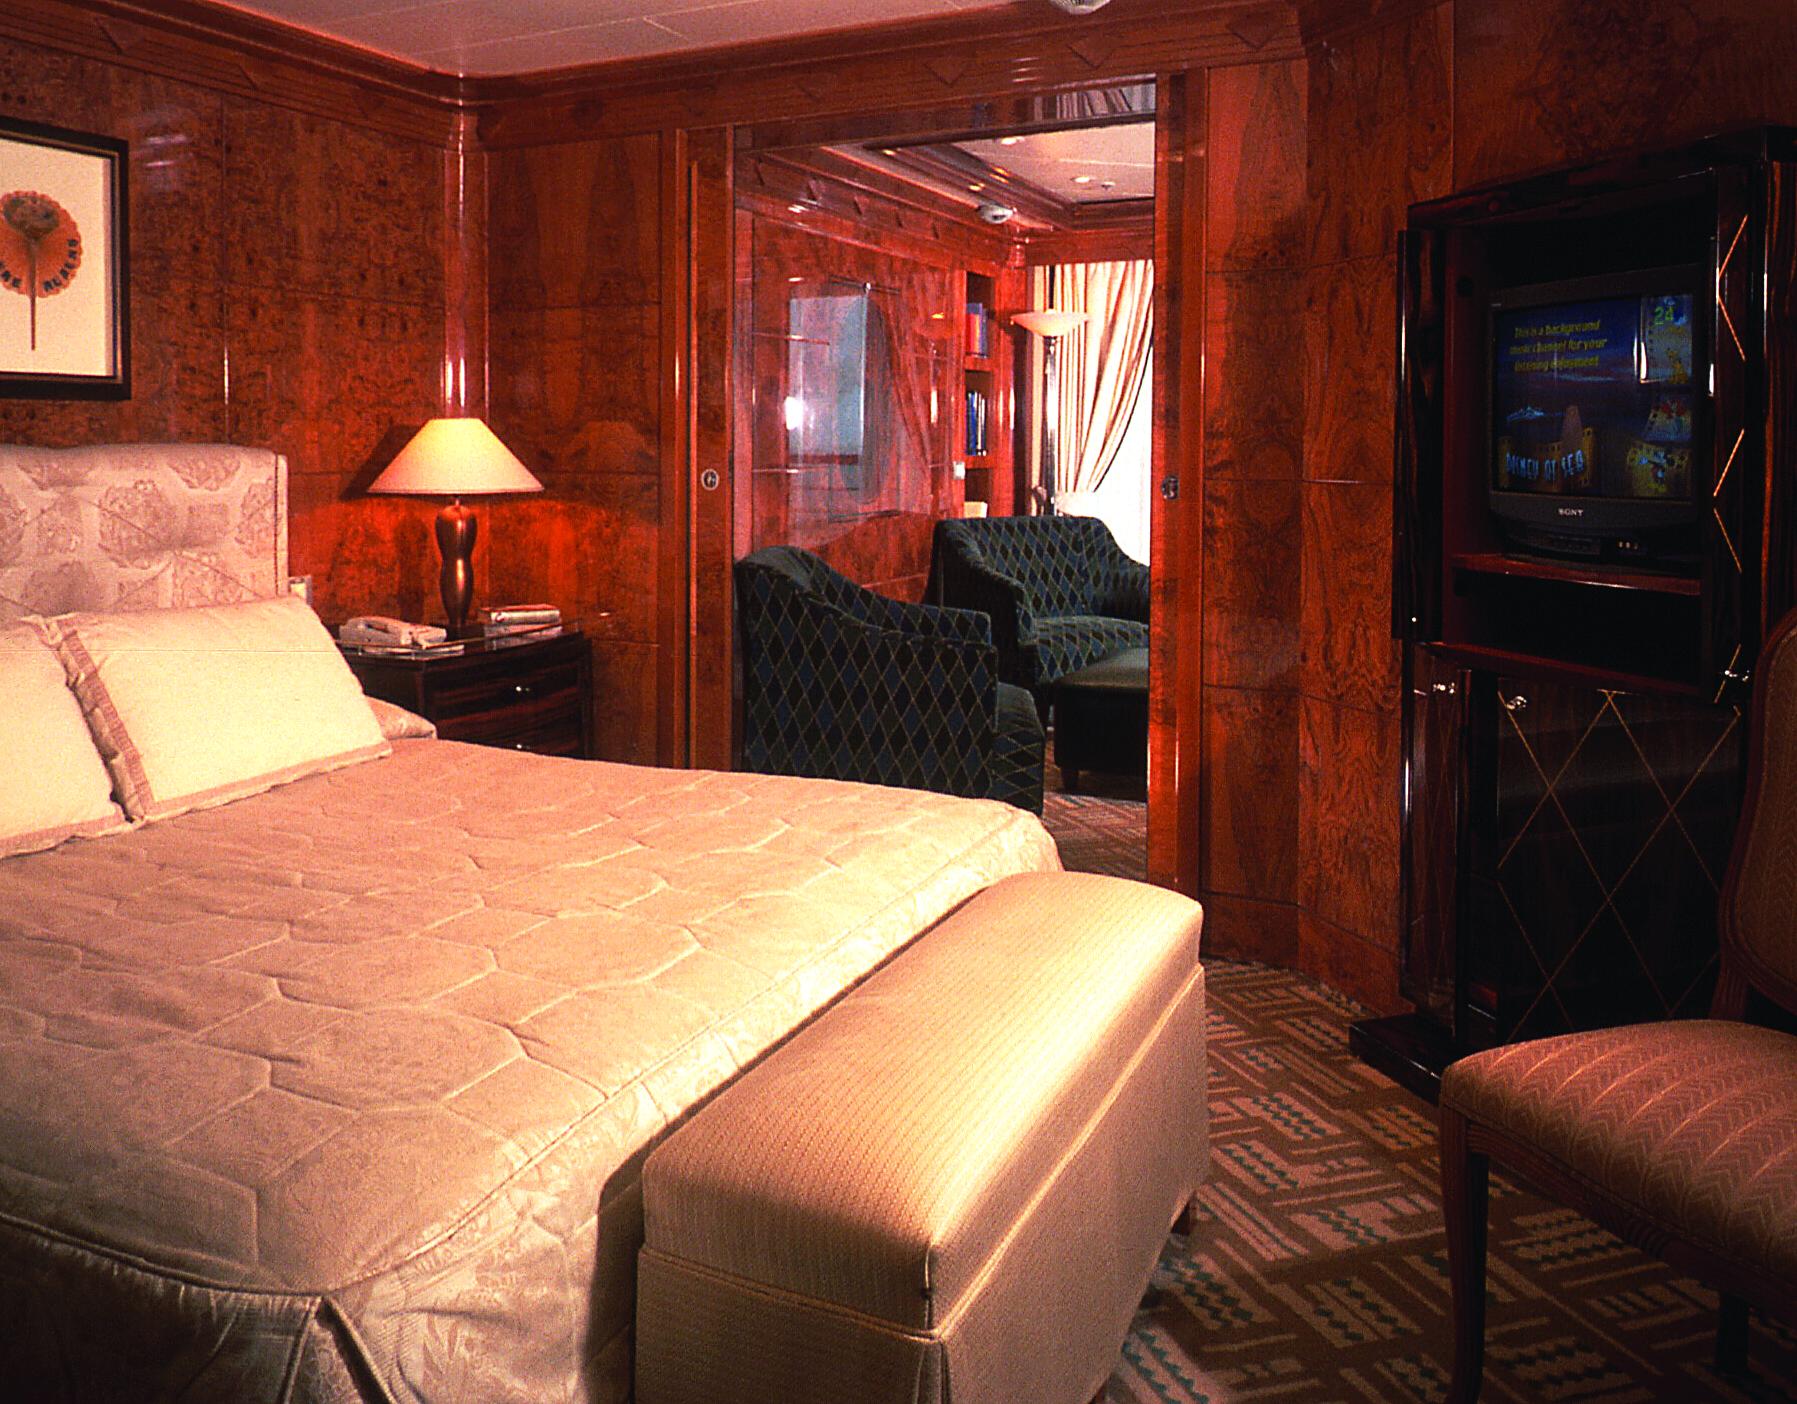 Disney Cruise Line Accommodation Suite.jpg